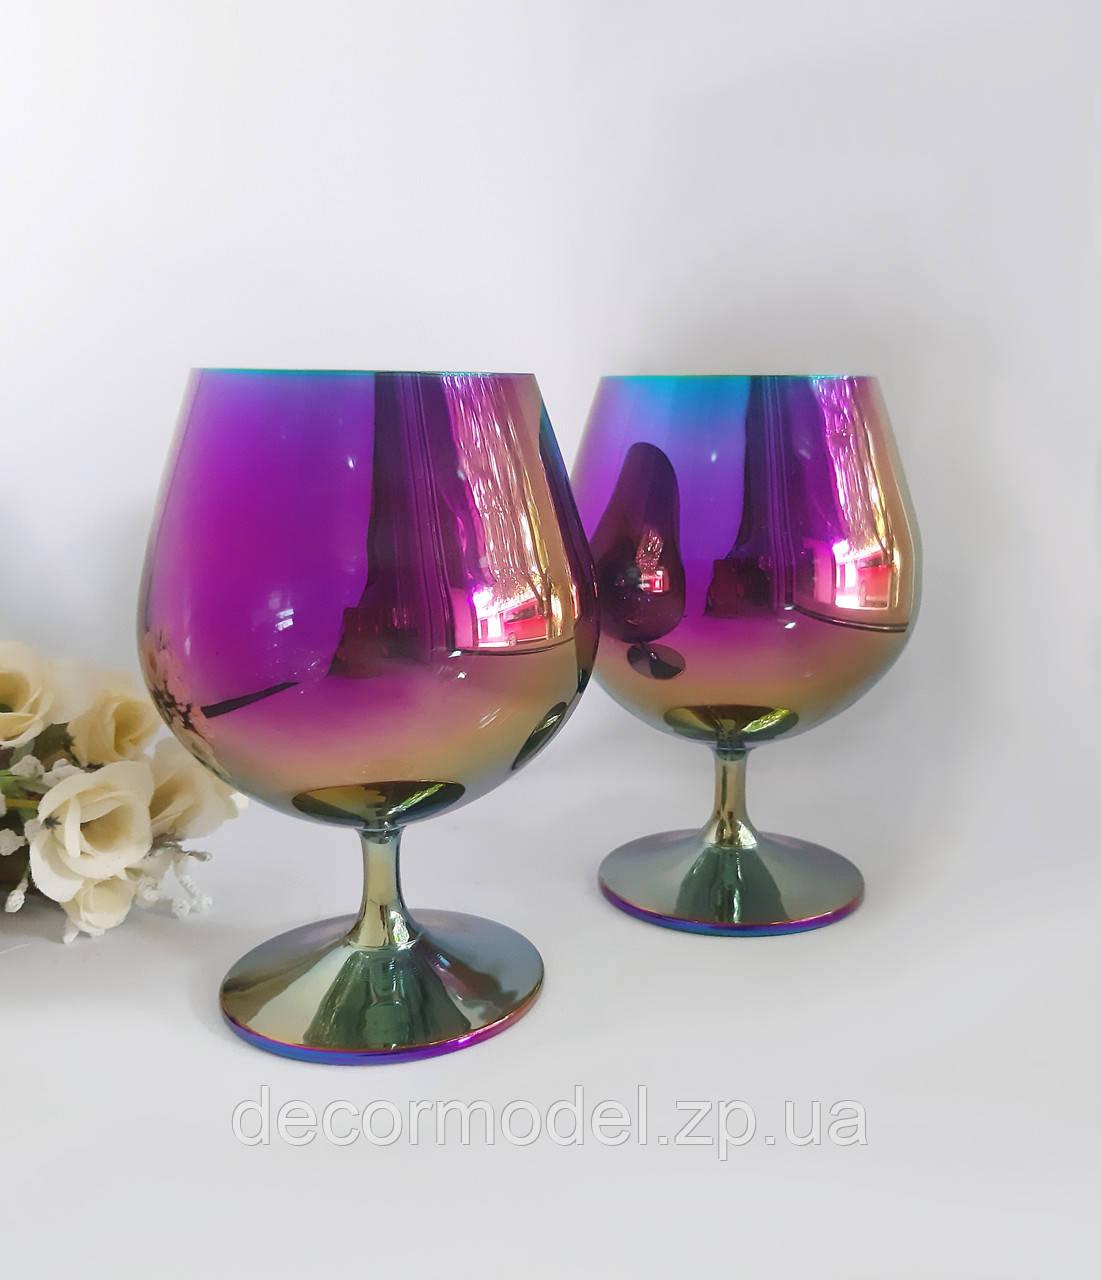 Набор бокалов для бренди Aurora Modena 400 ml (цвет: РАДУГА сияние)